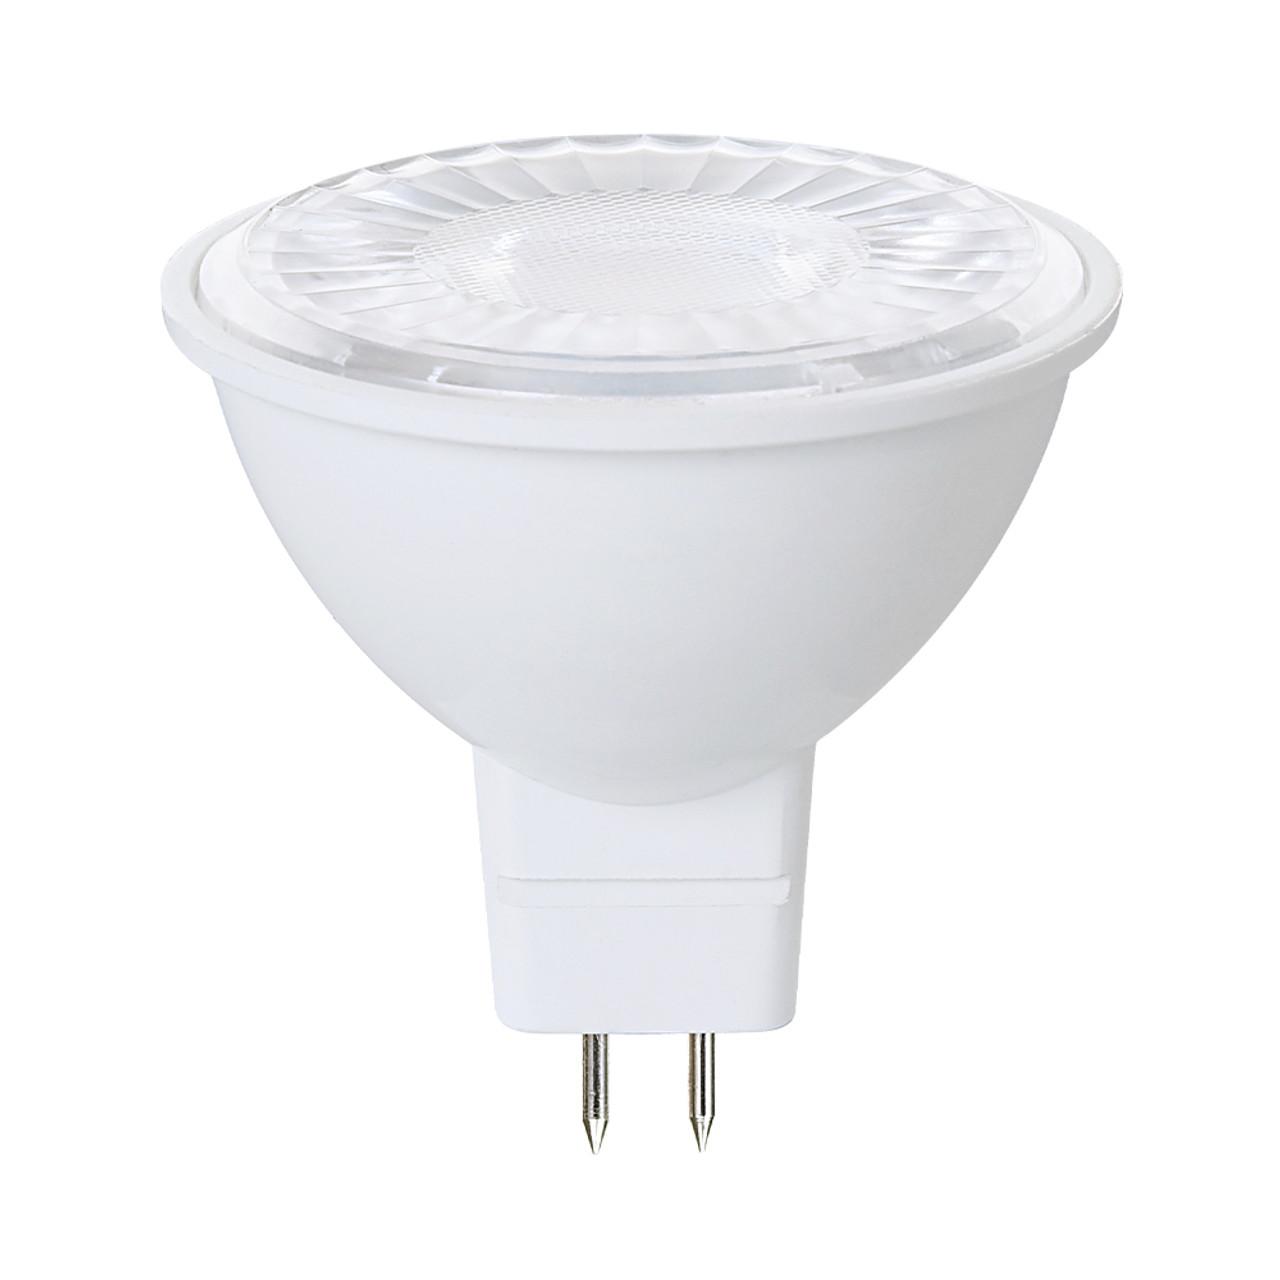 MR16, Directional (Wide Spot), LED Light Bulb, Dimmable, 7 W, 12 V, 500 lm, 2700 K, GU5.3 Base (EM16-7W4020ew)